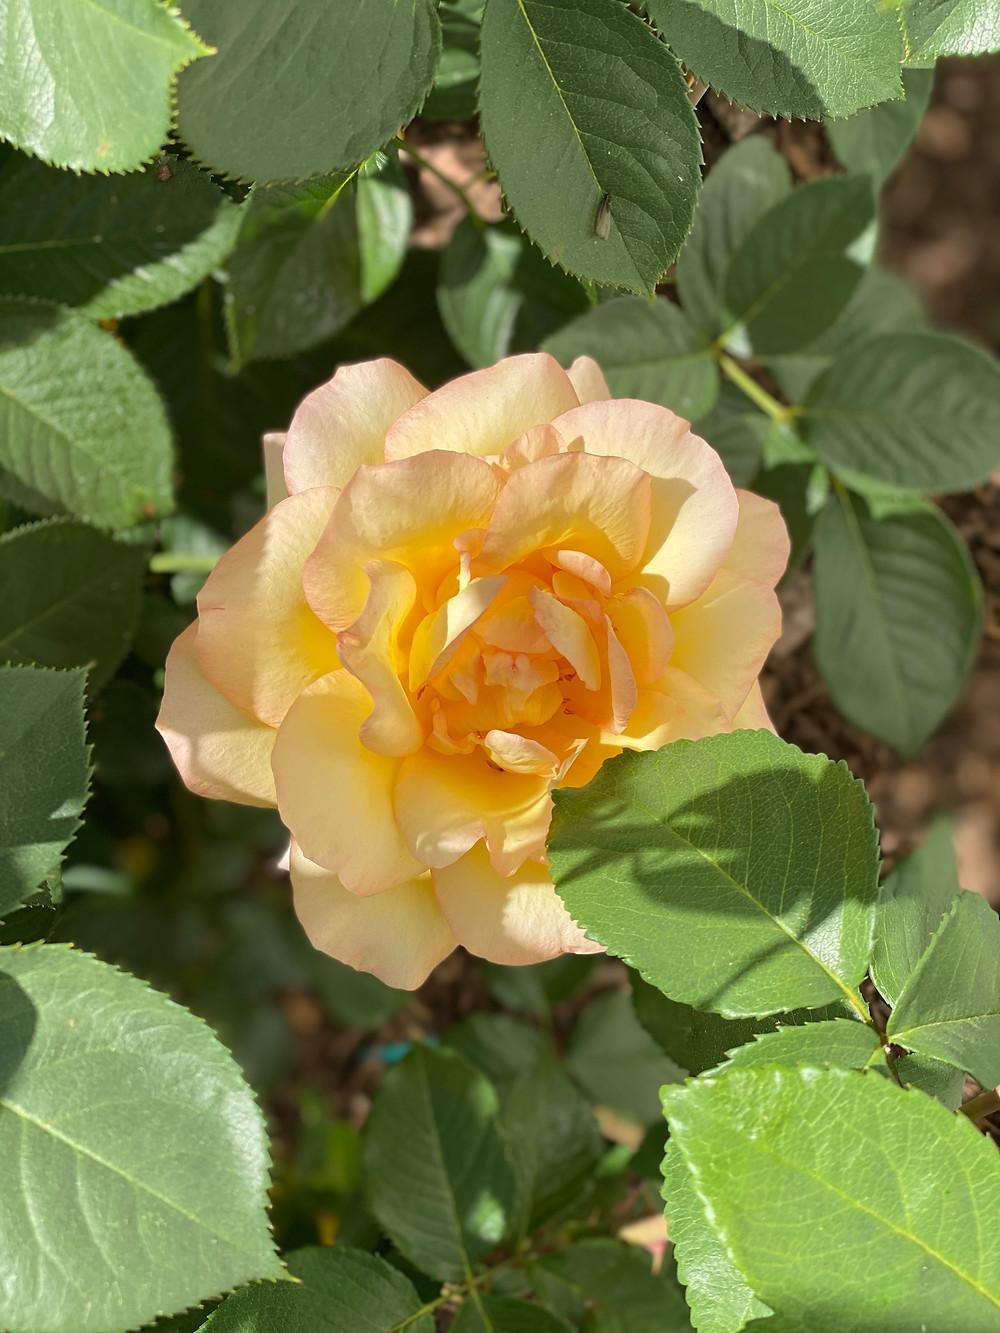 Yellow rose bush at RockHavenFarm.com